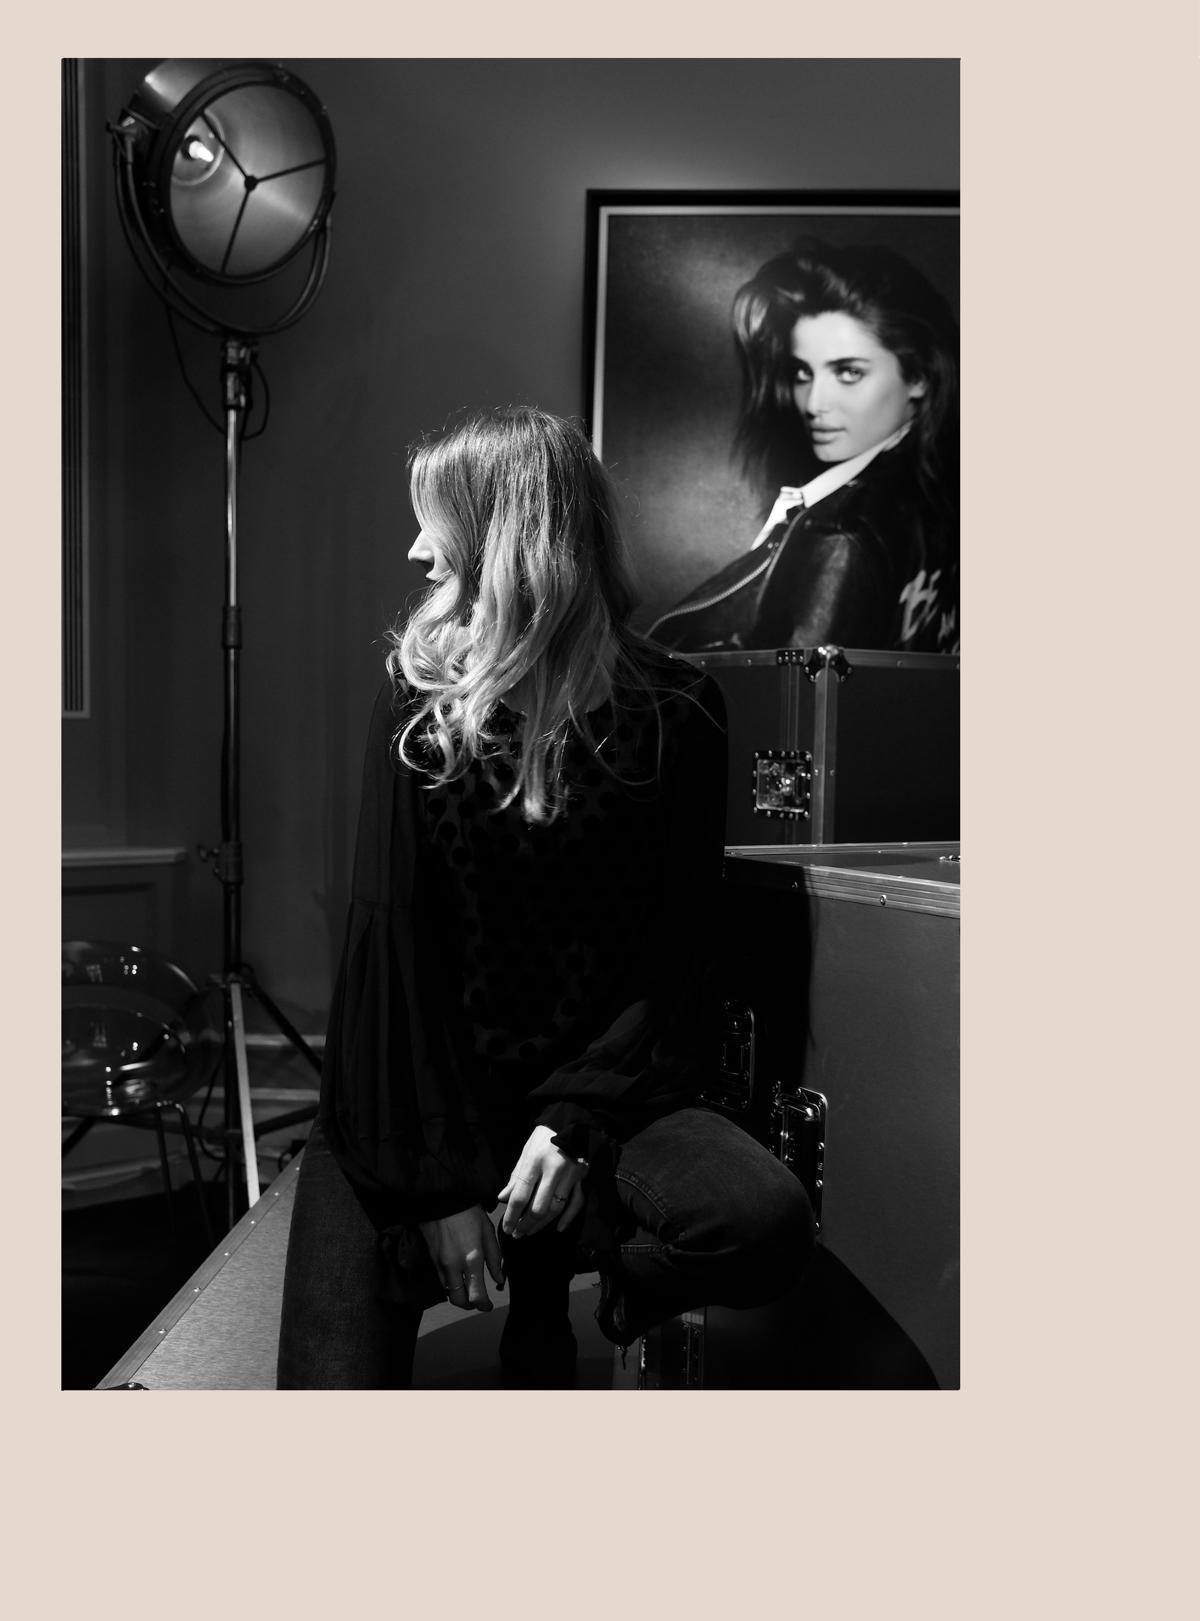 Beautyblog Beautyblogger BARE MINDS Elina Neumann